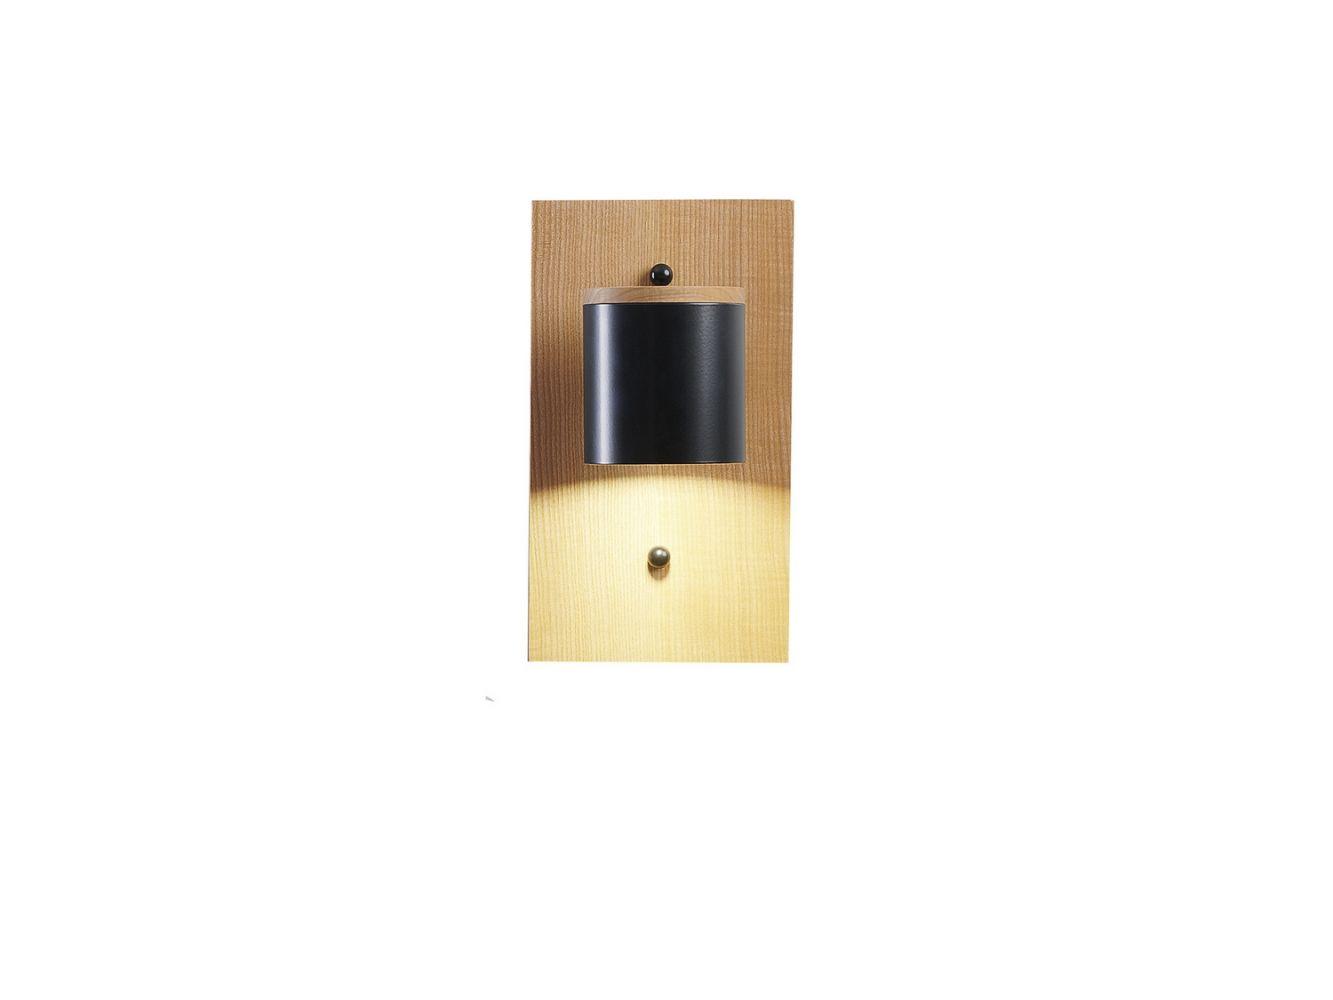 Ecolight Deco 003964